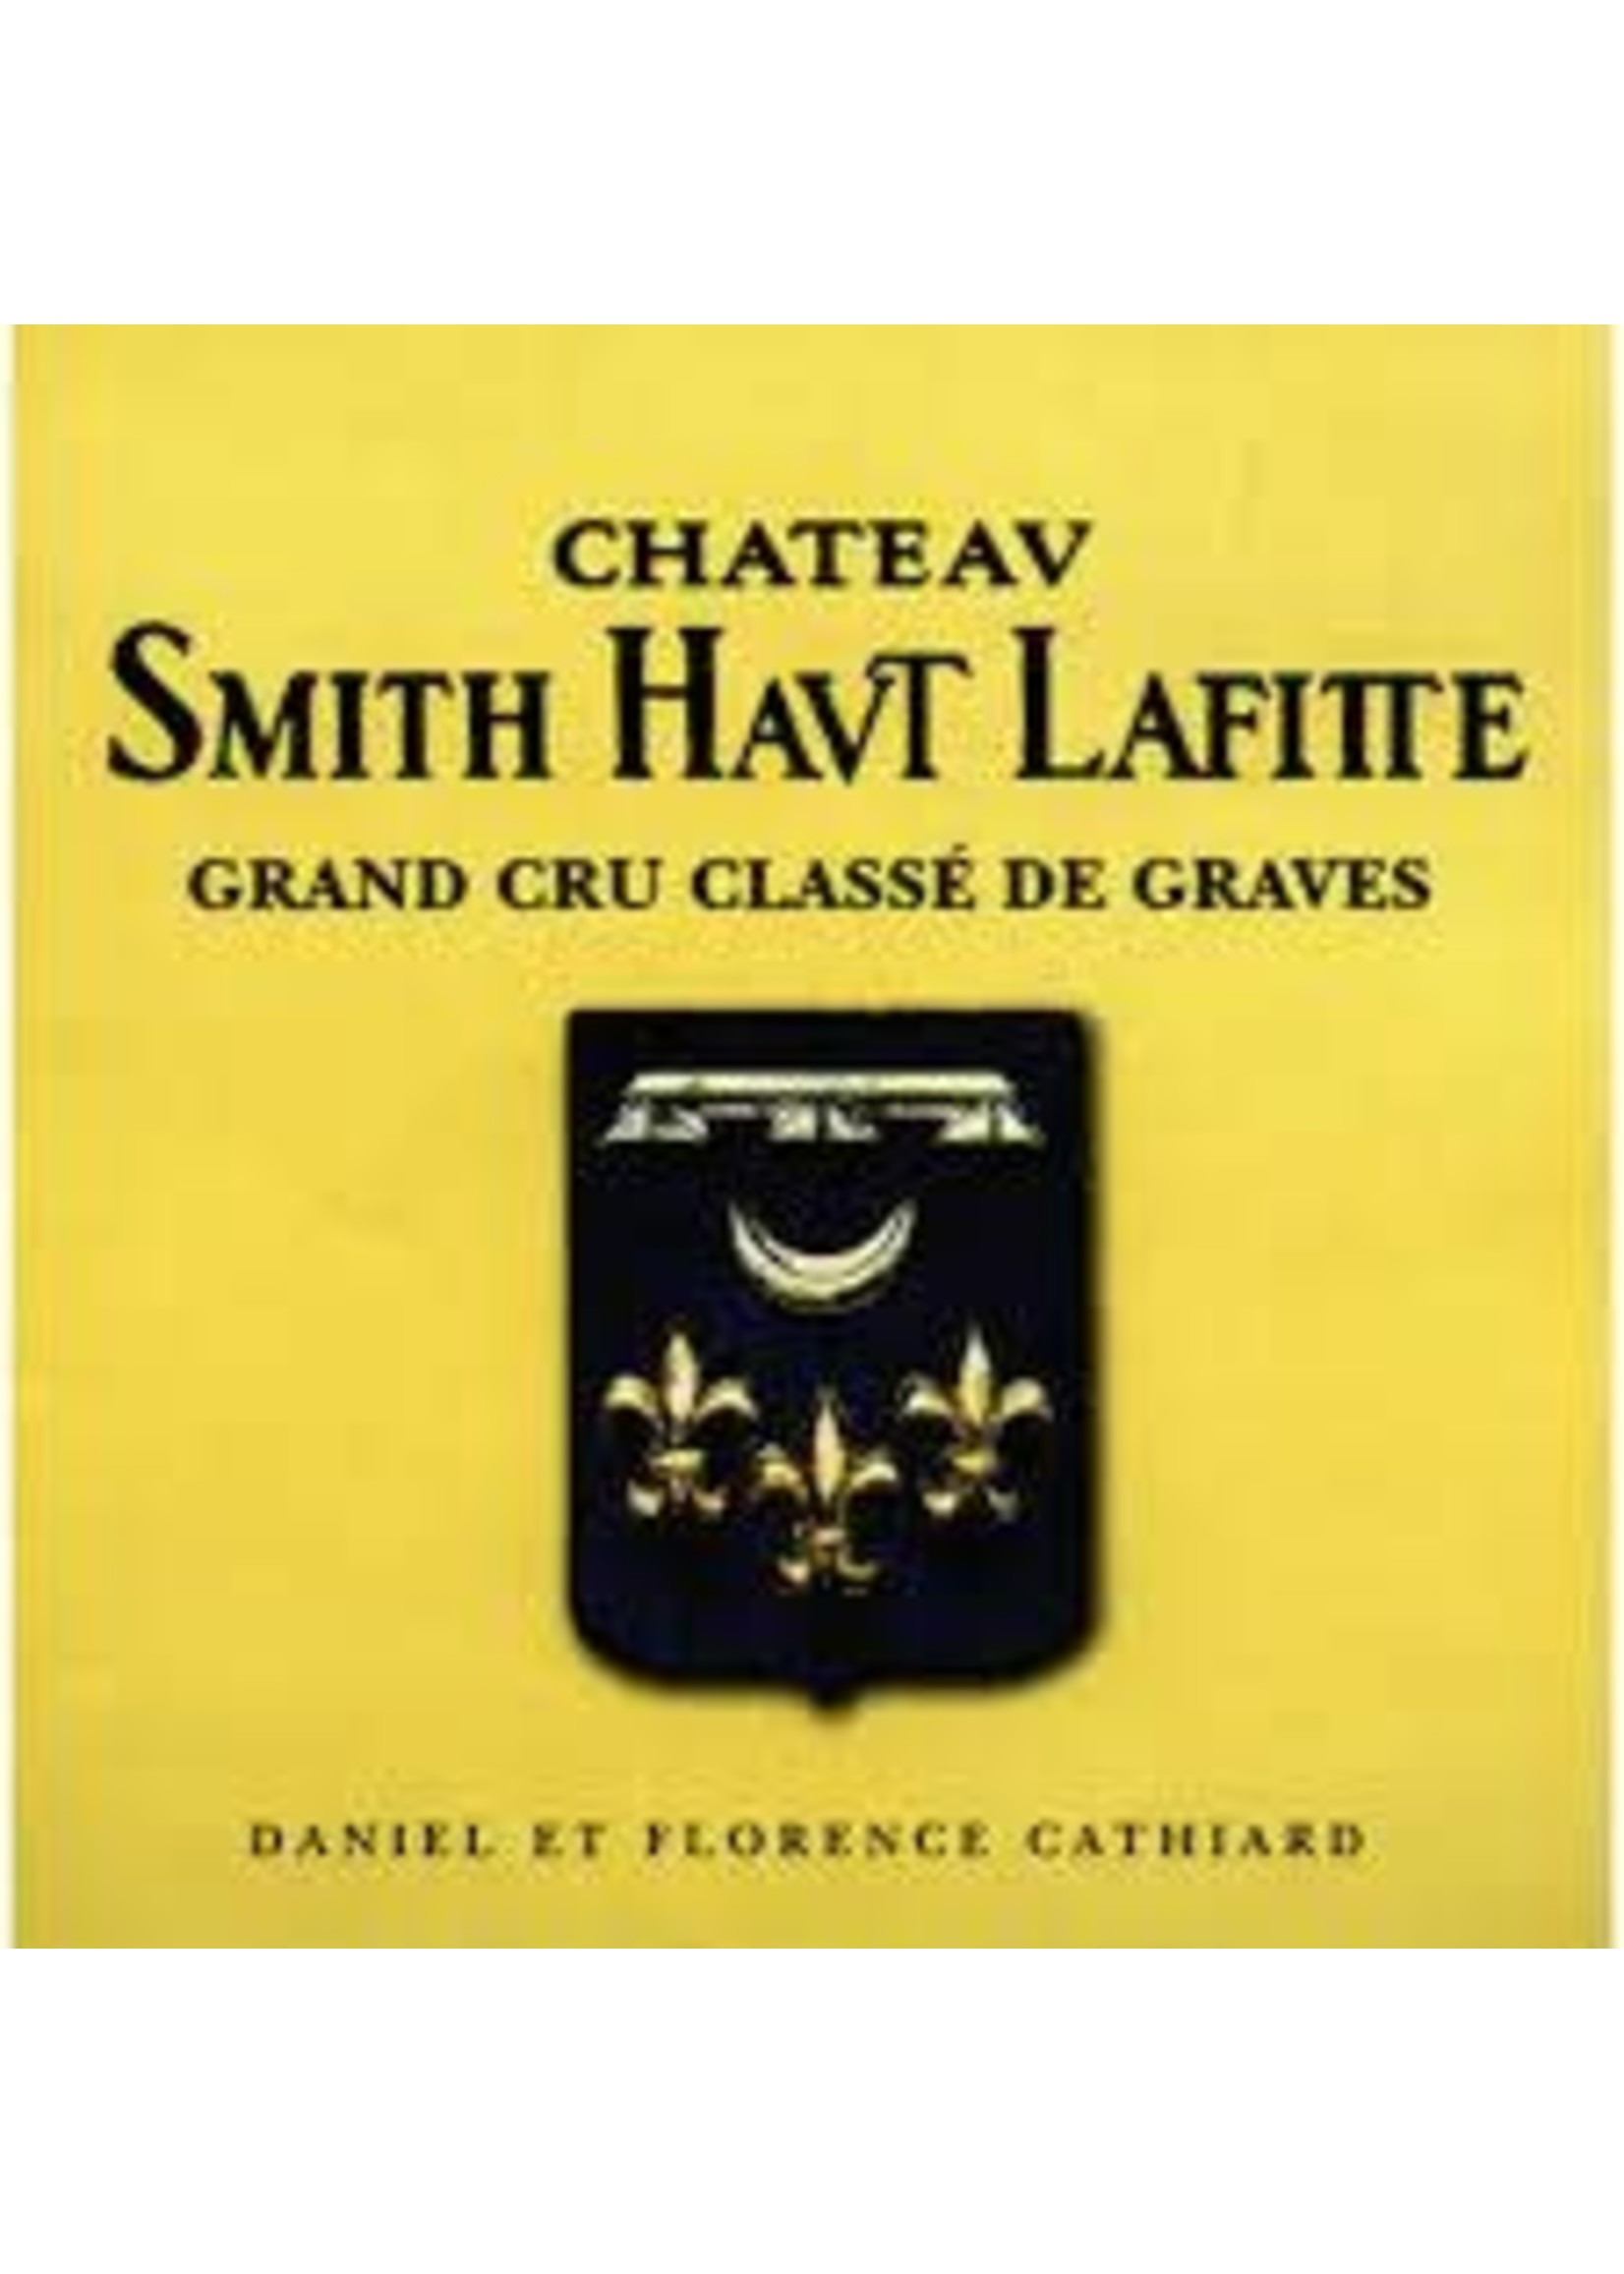 Chateau Smith Haut Lafitte 2000 Pessac Leognan 750ml [PRE-ARRIVAL]